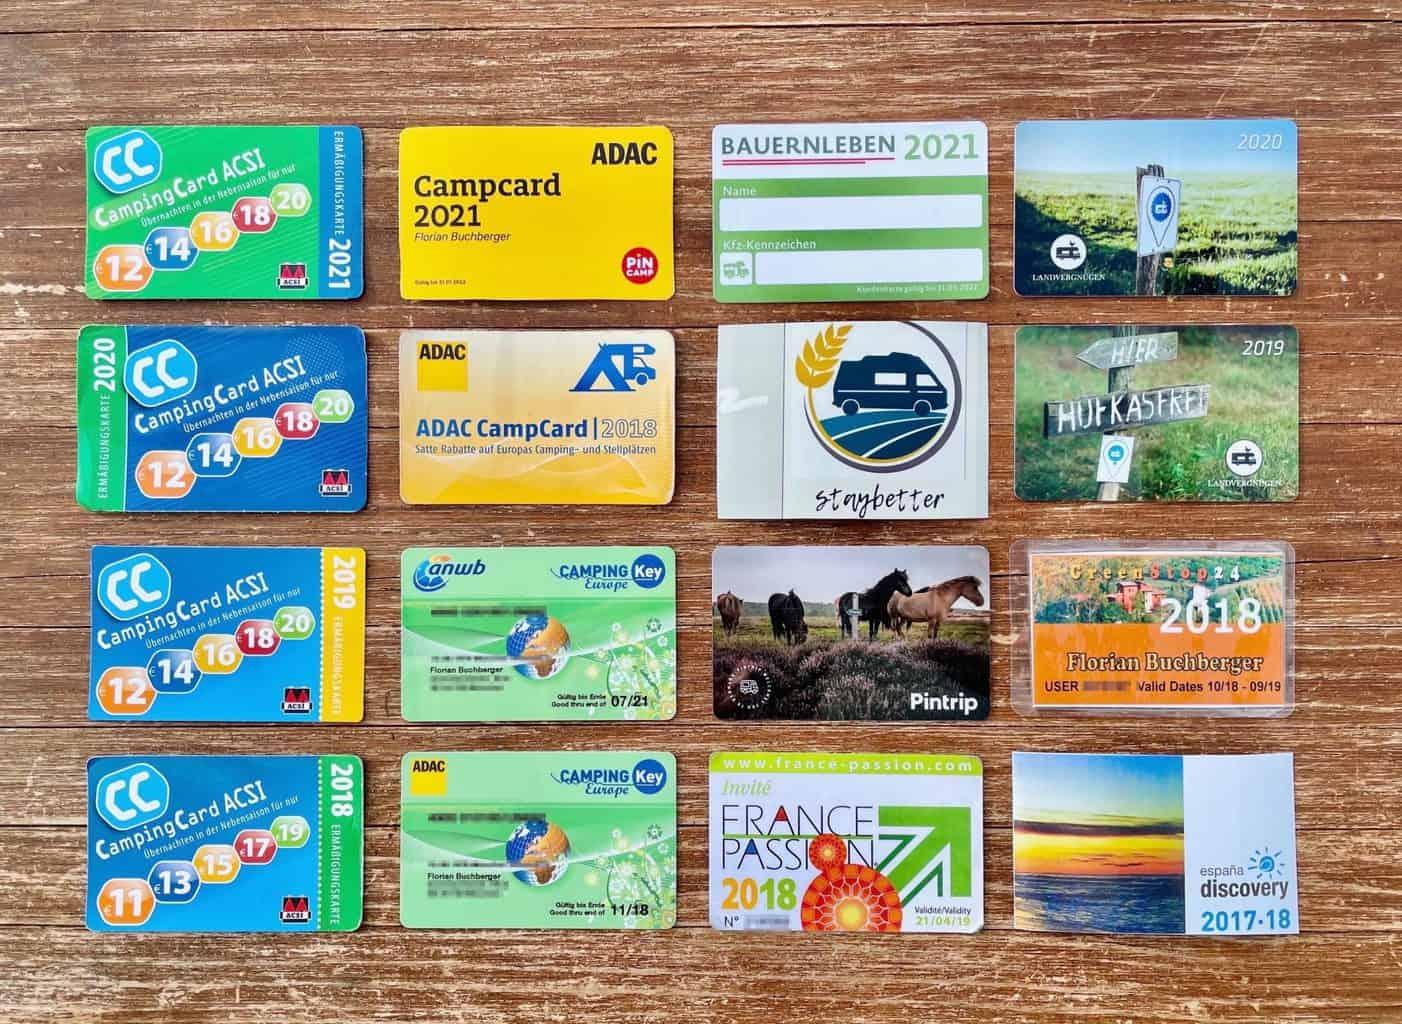 Campingkarten-ACSI-ADAC-CKE-CLUBID-FRANCE-PASSION-GREENSTOP24-LANDVERGNÜGEN-STAYBETTER-FARM-ESPANA-DISCOVERY-BAUERNLEBEN-PINTRIP-GREENSTOP24